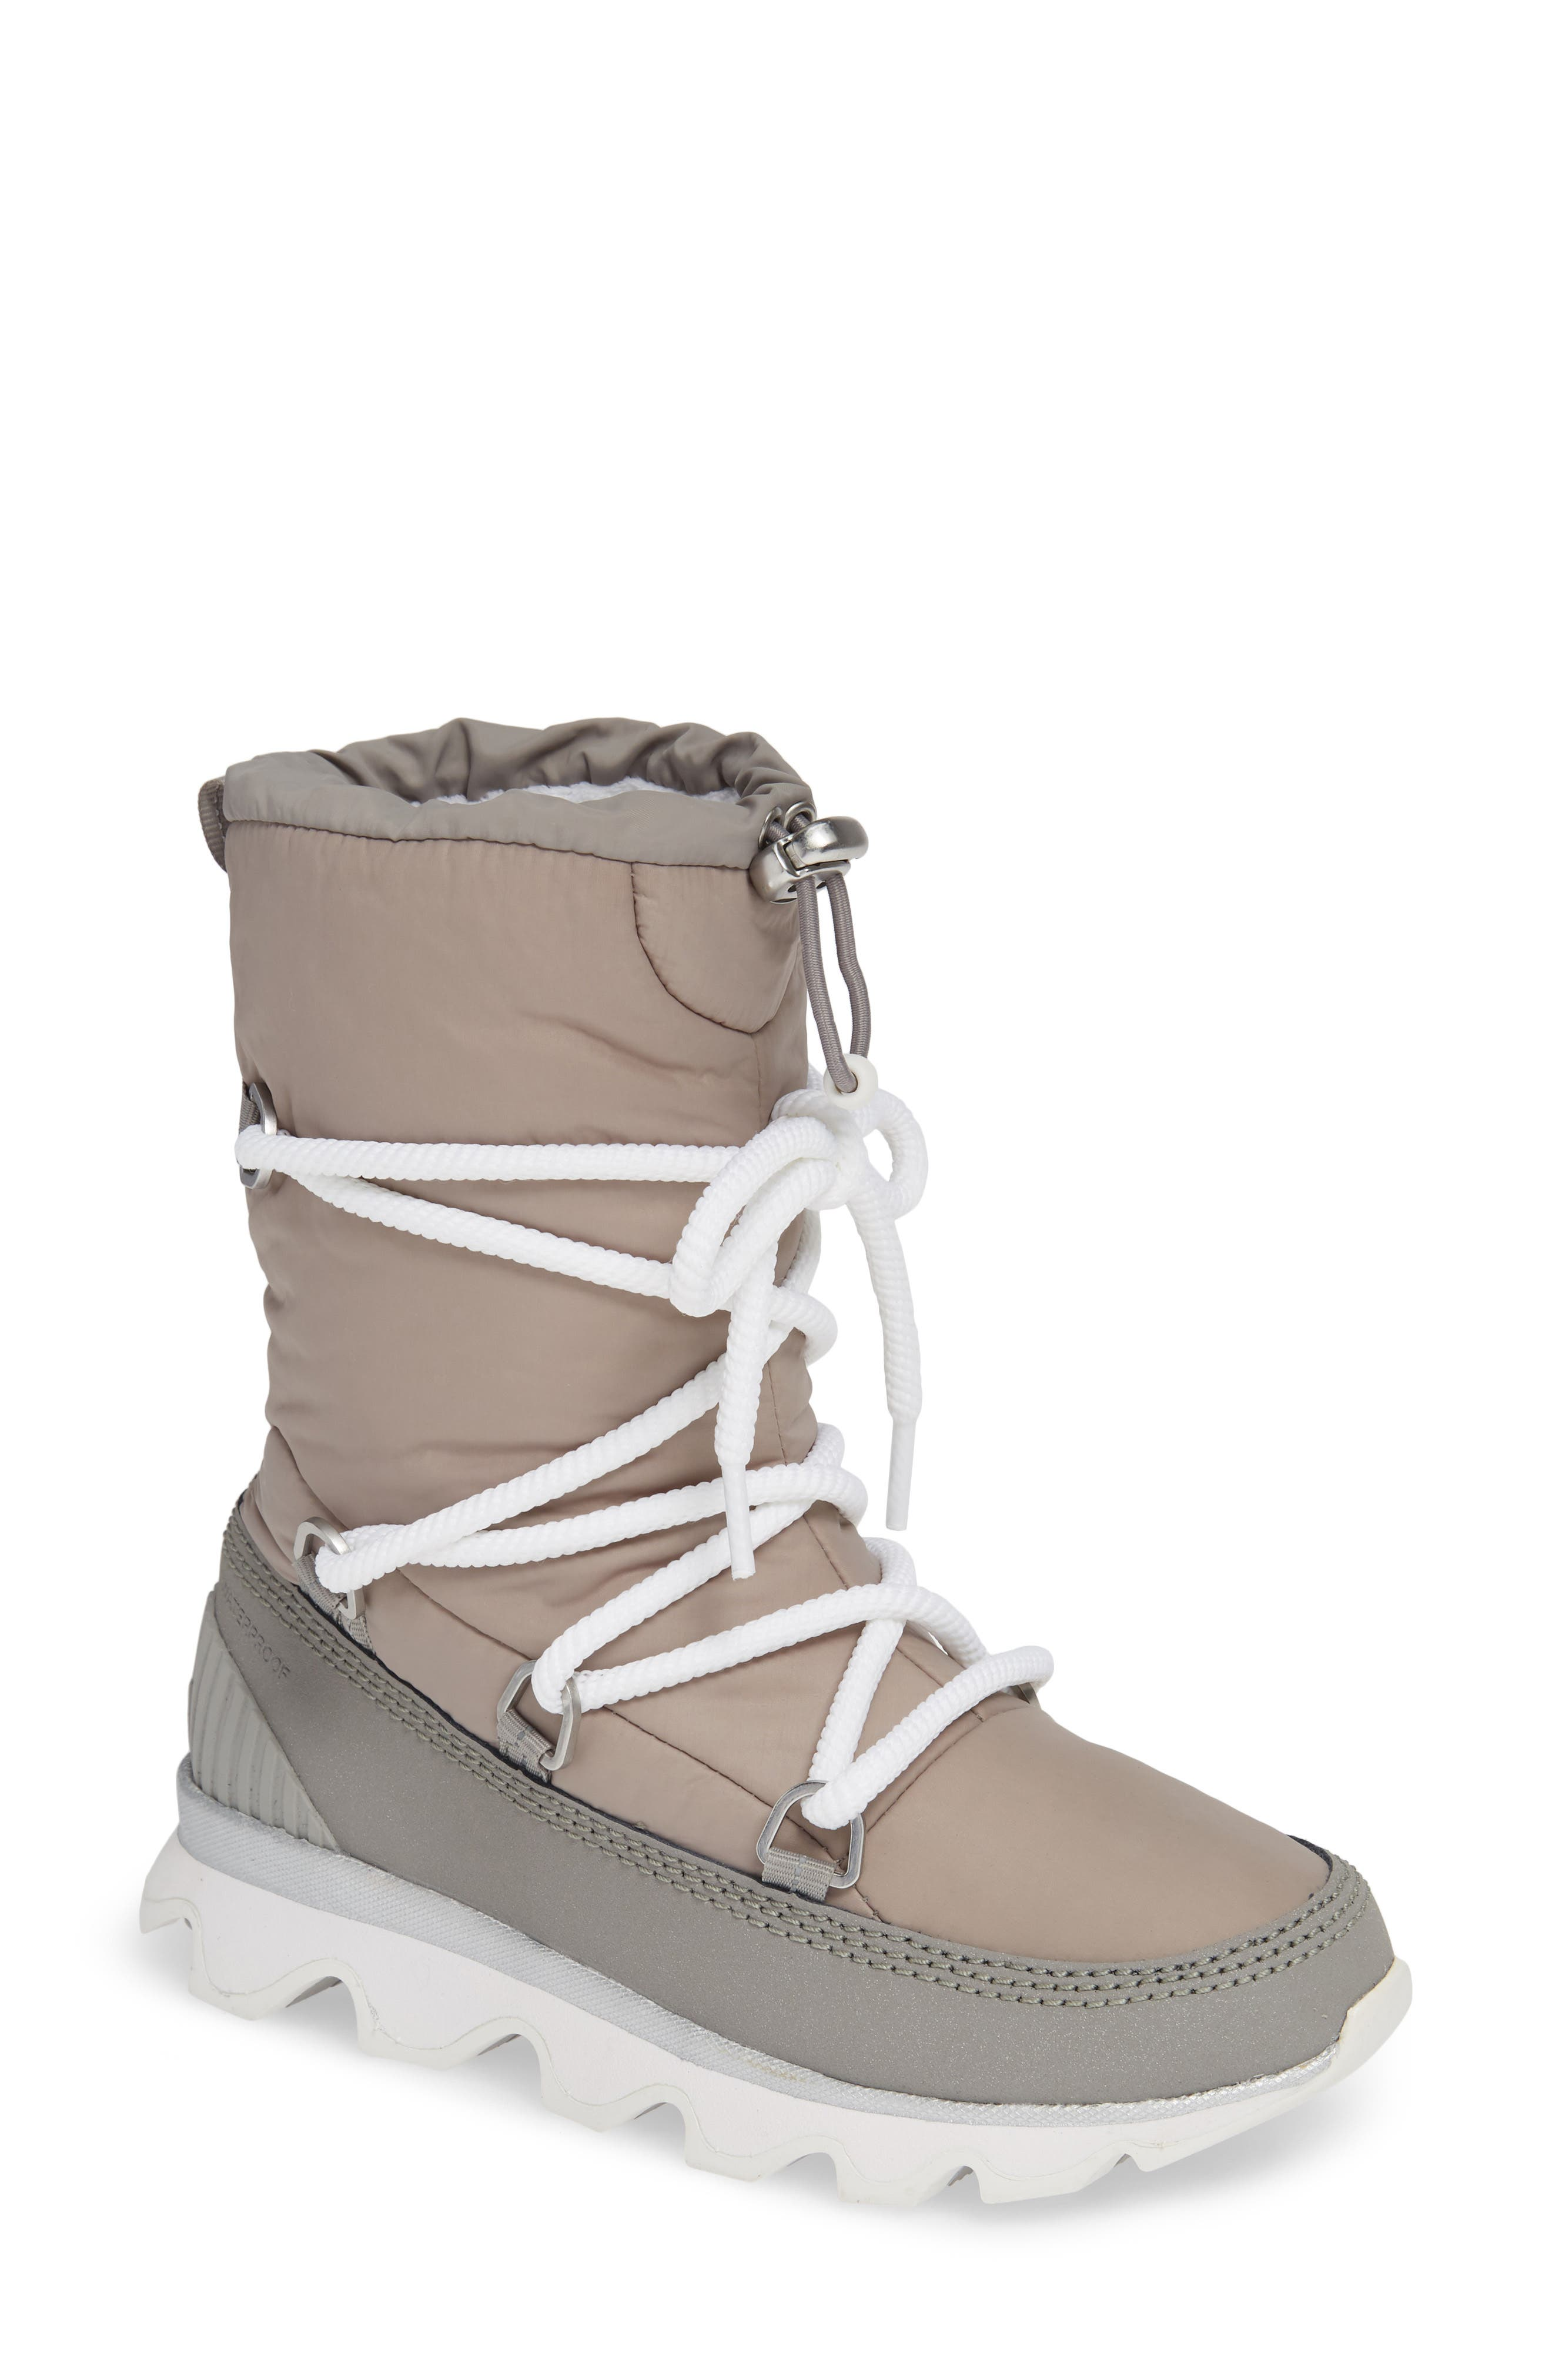 sorel men's winter boots clearance